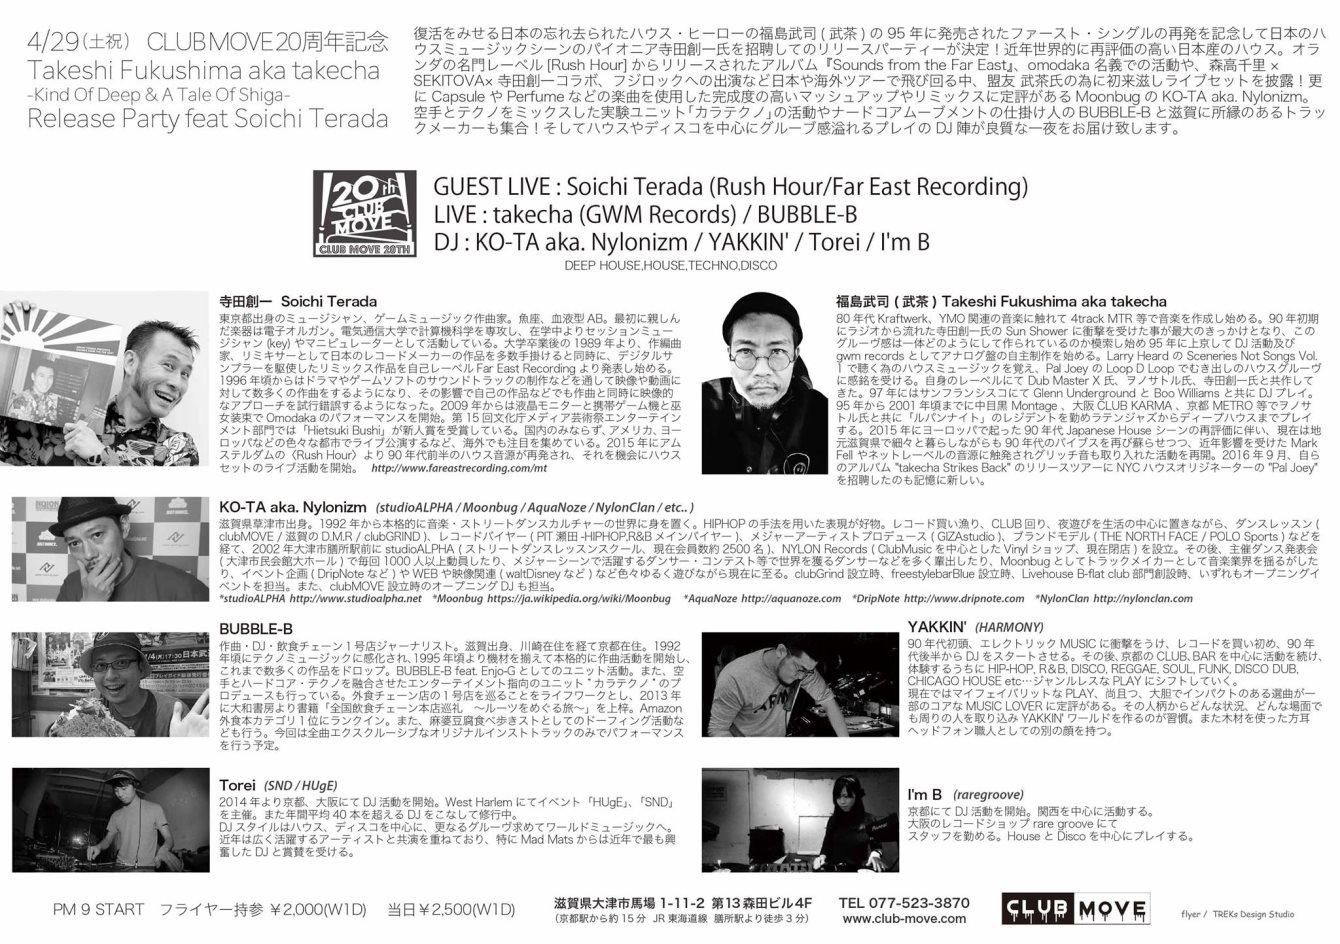 Takeshi Fukushima -Kind Of Deep & A Tale Of Shiga- Release Party feat. Soichi Terada - Flyer back